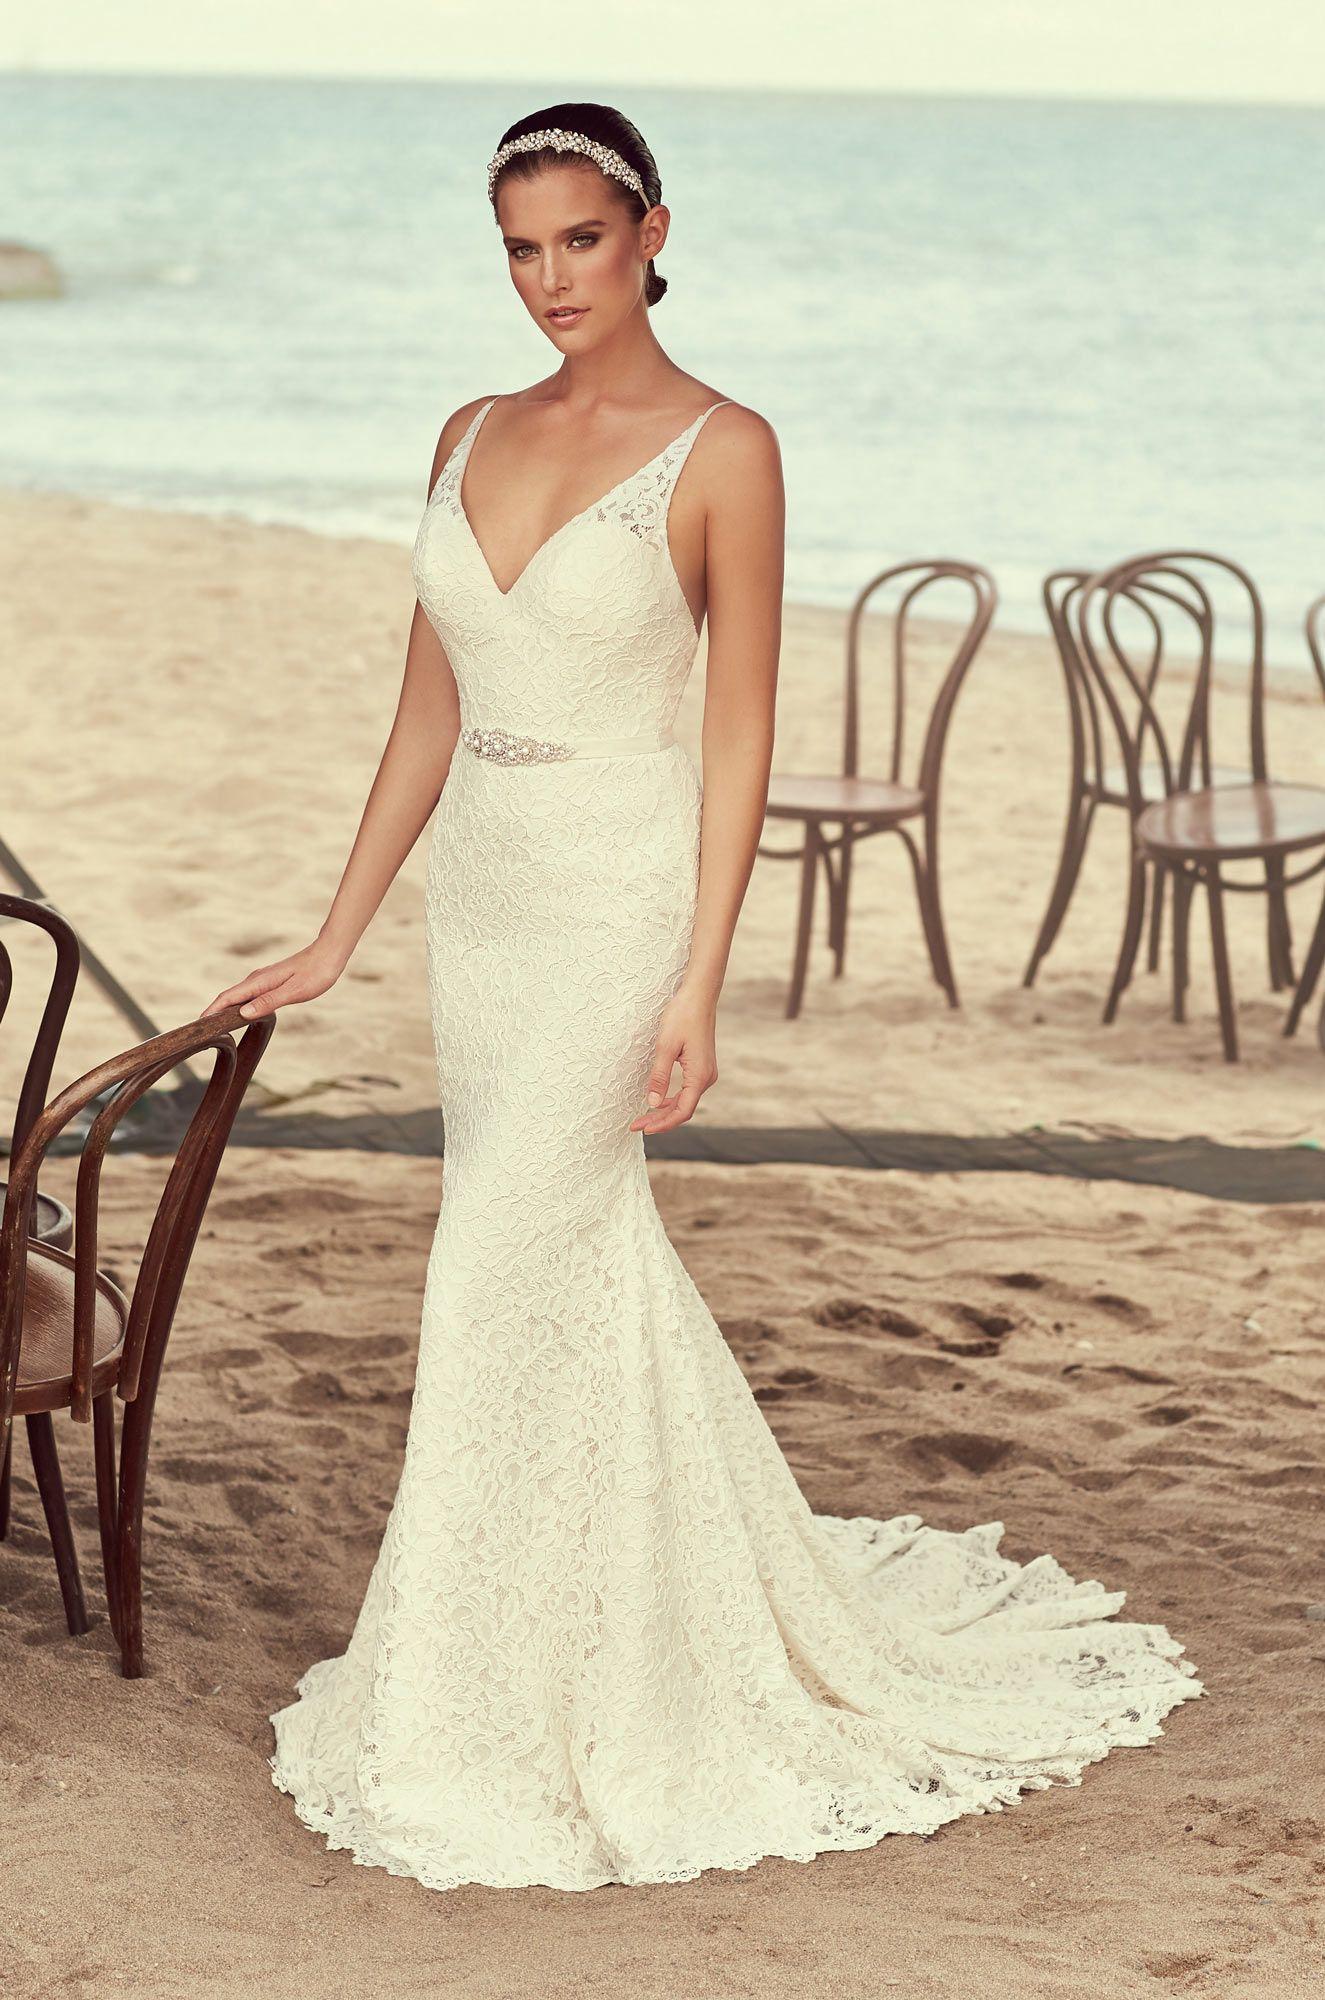 Style 2194 | Mikaella #Lace #WeddingDress. Mikaella Lace V-neckline bodice  with spaghetti straps. Fabric belt with beaded appliqué at waist.